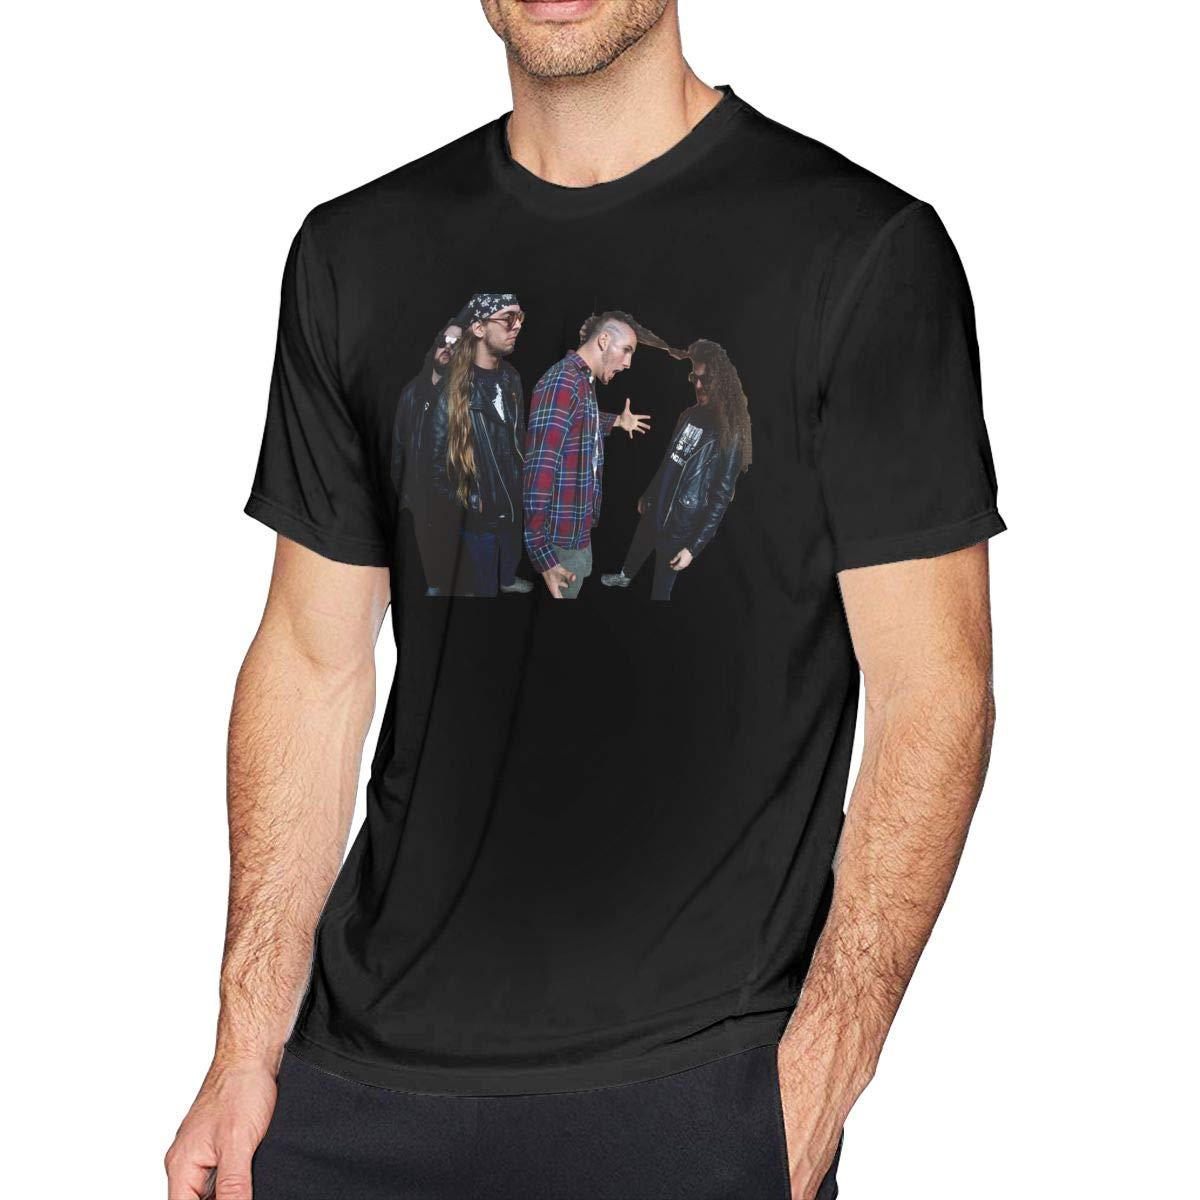 Aifreedom1 Social Distortion Funny Shirt Black 4